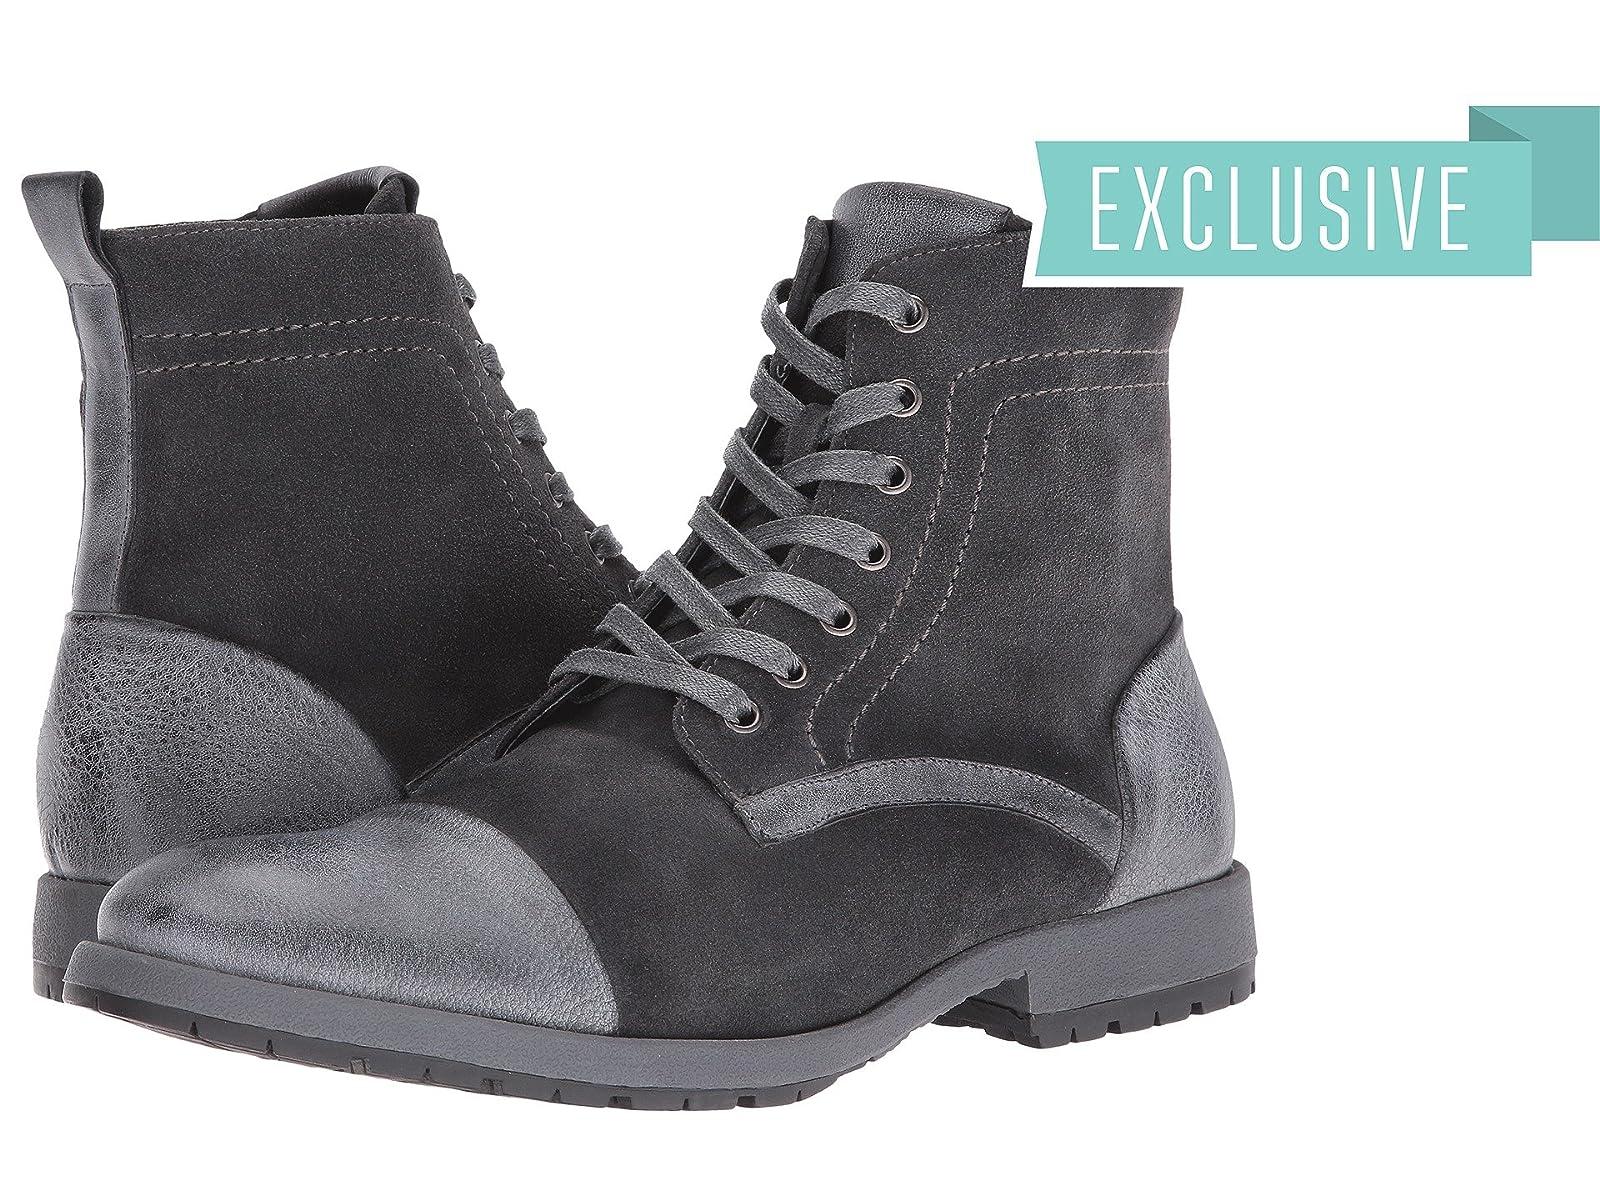 Robert Wayne RaineCheap and distinctive eye-catching shoes